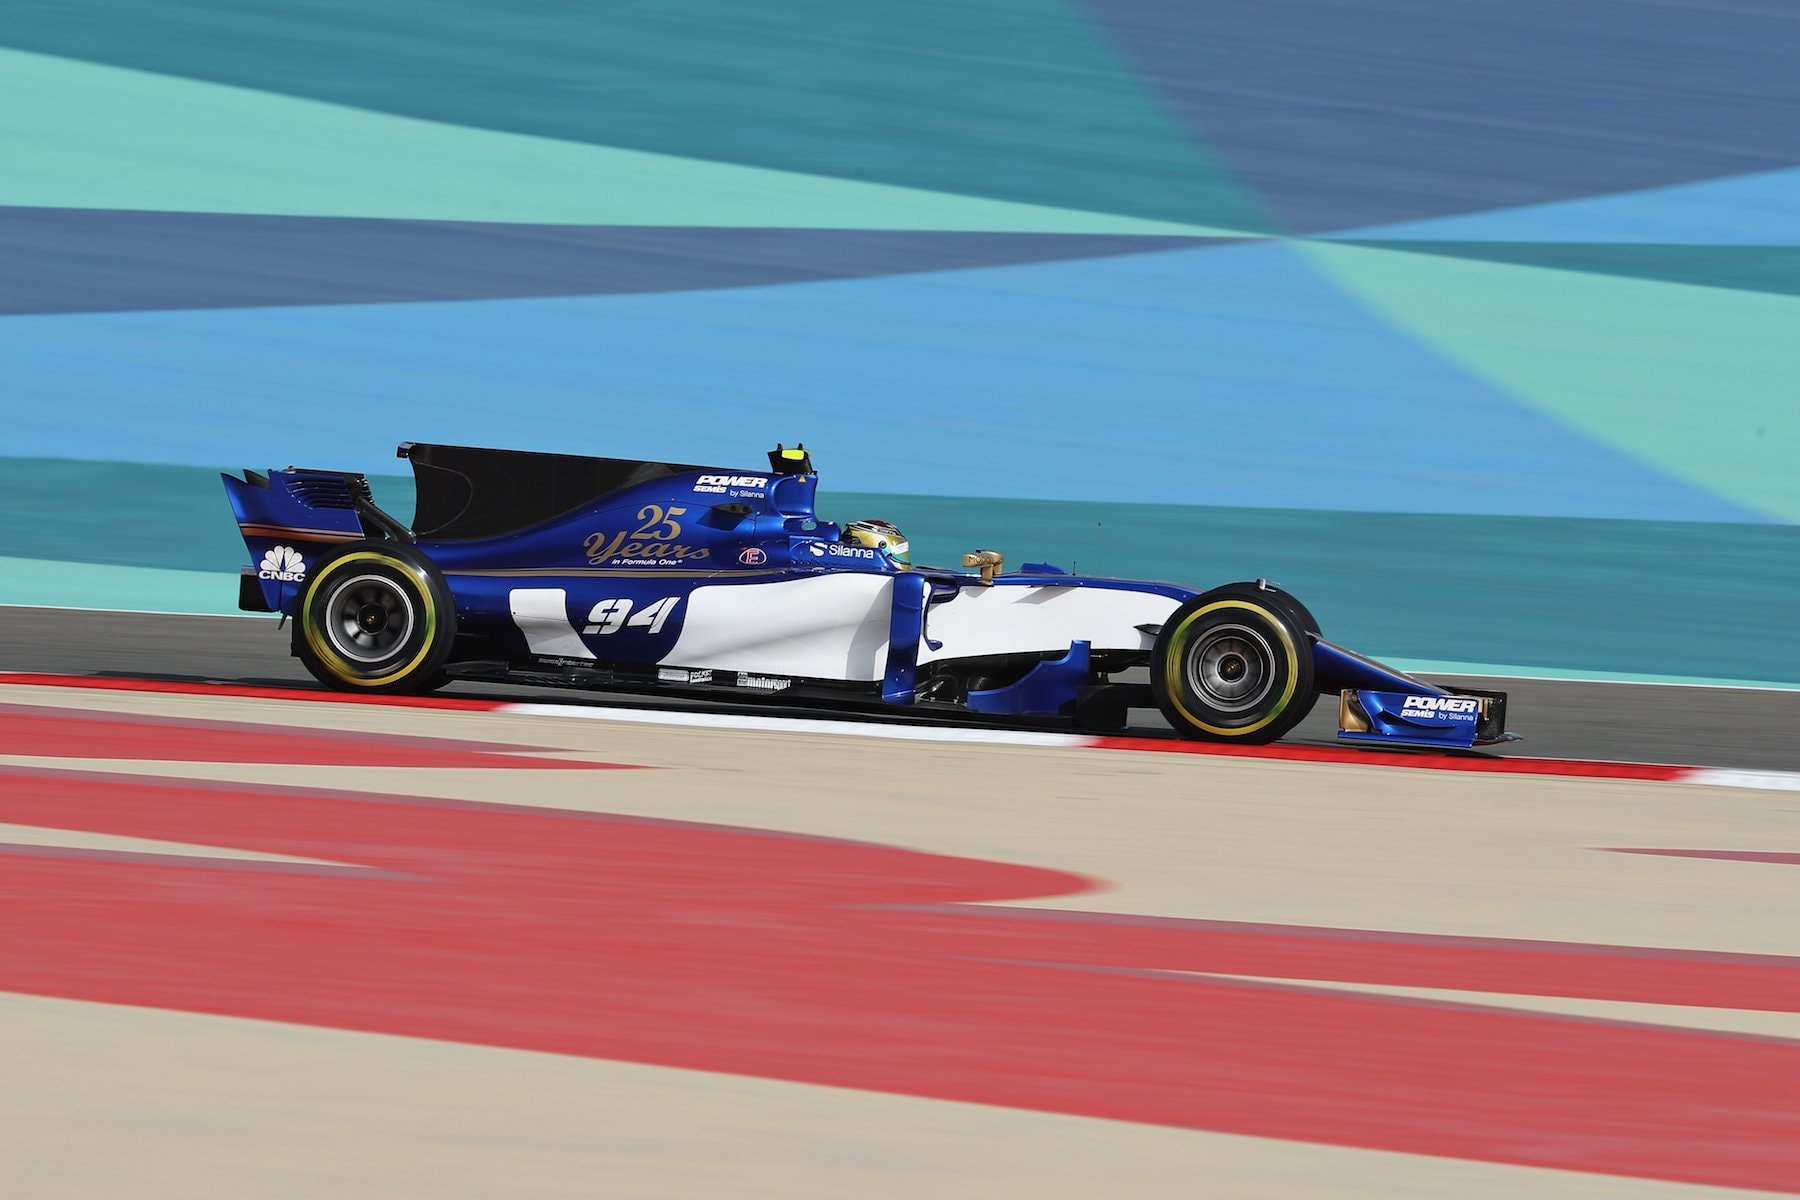 2017 Pascal Wehrlein   Sauber C36   2017 Bahrain GP FP3 1 copy.jpg